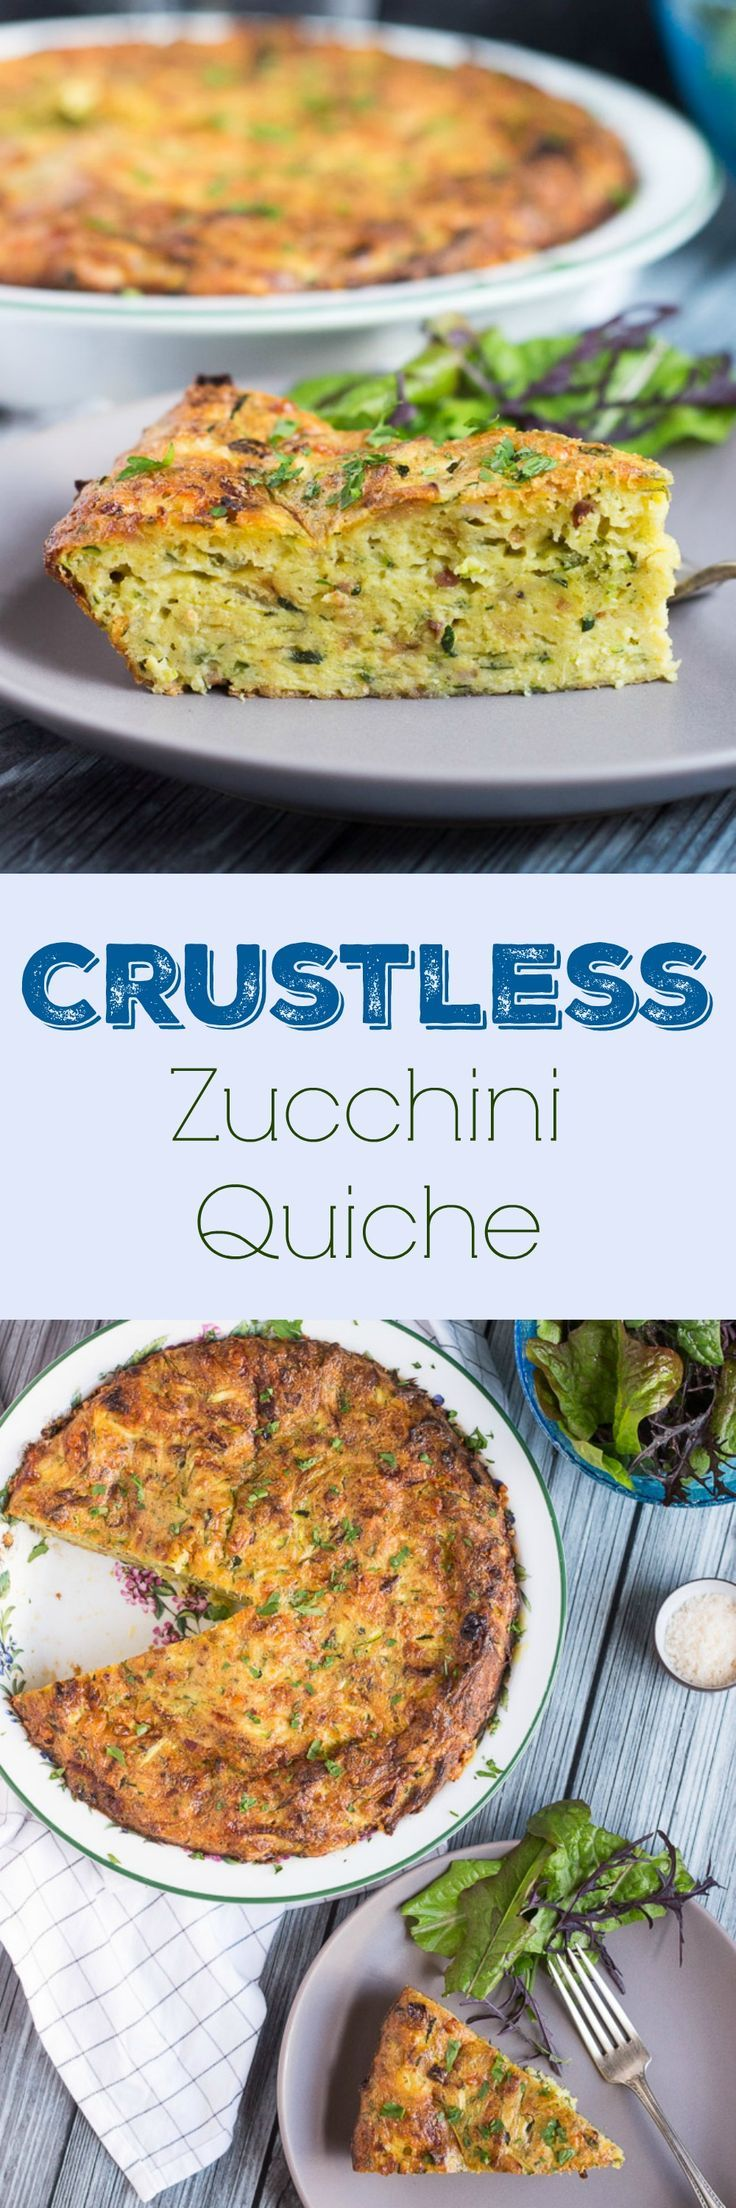 Crustless Zucchini Quiche. Quick to make, & a good way to use up an abundant…